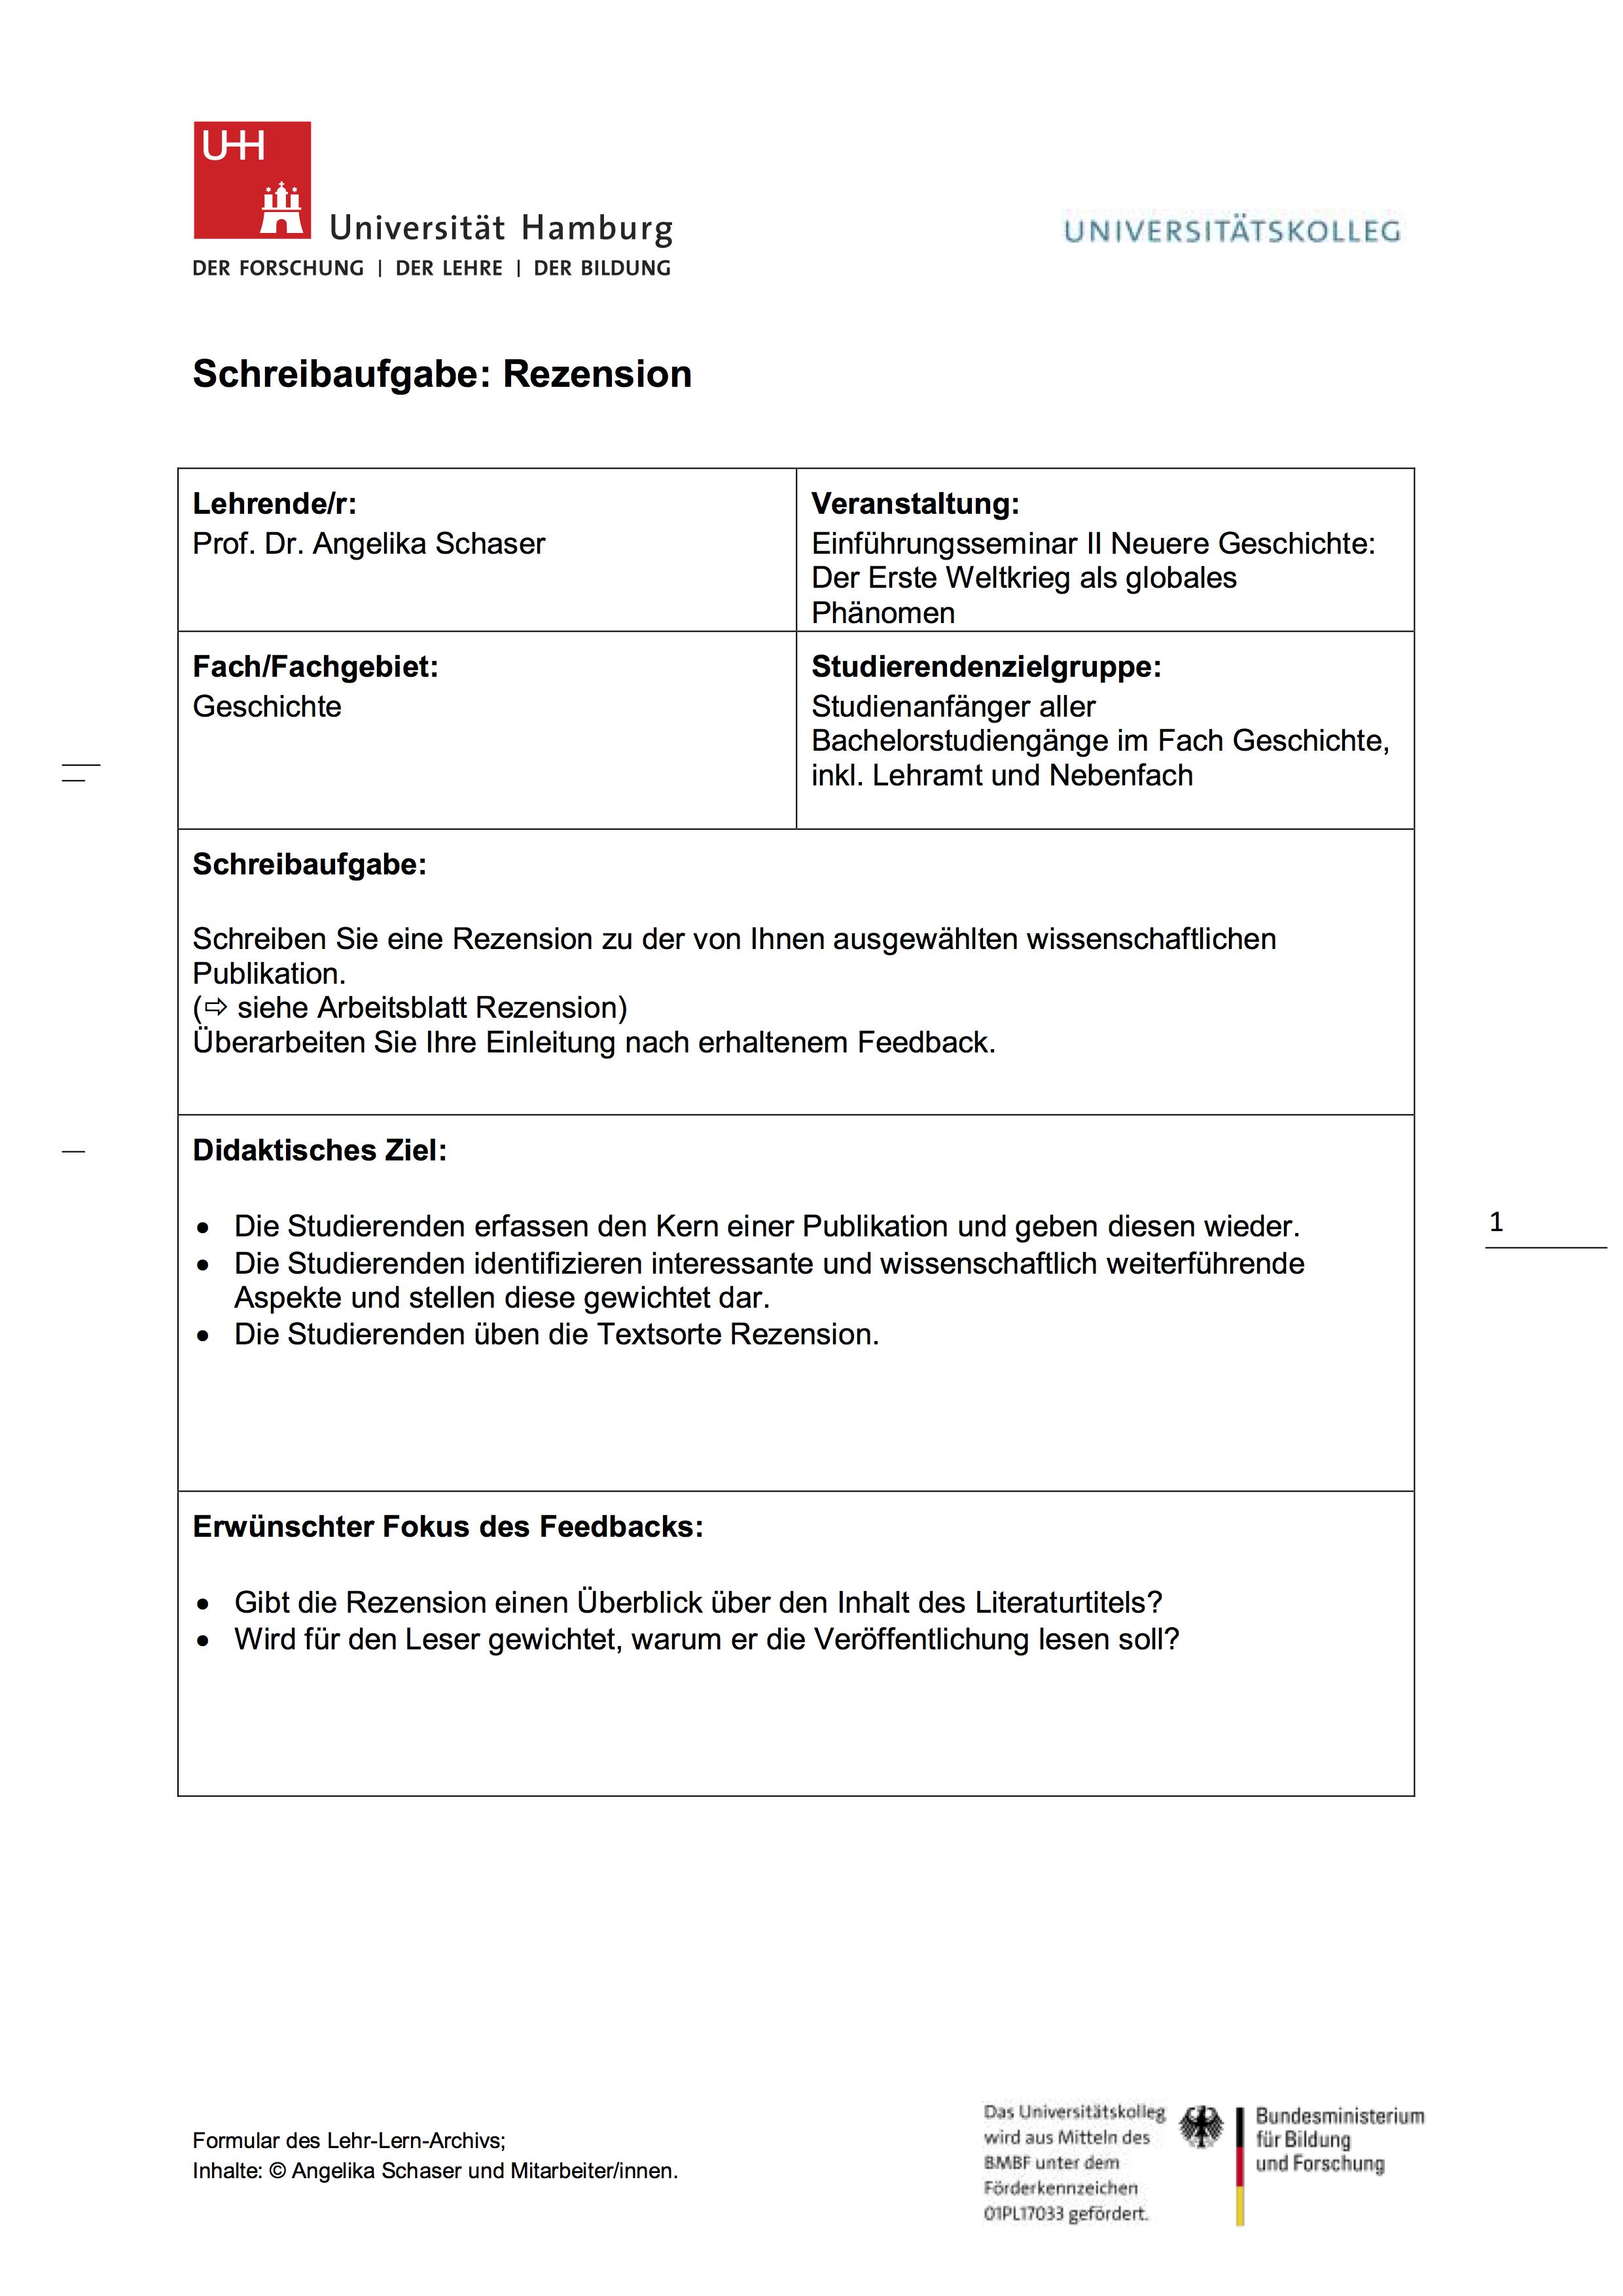 Großzügig Mitarbeiter Teilnahmevorlage Fotos - Entry Level Resume ...